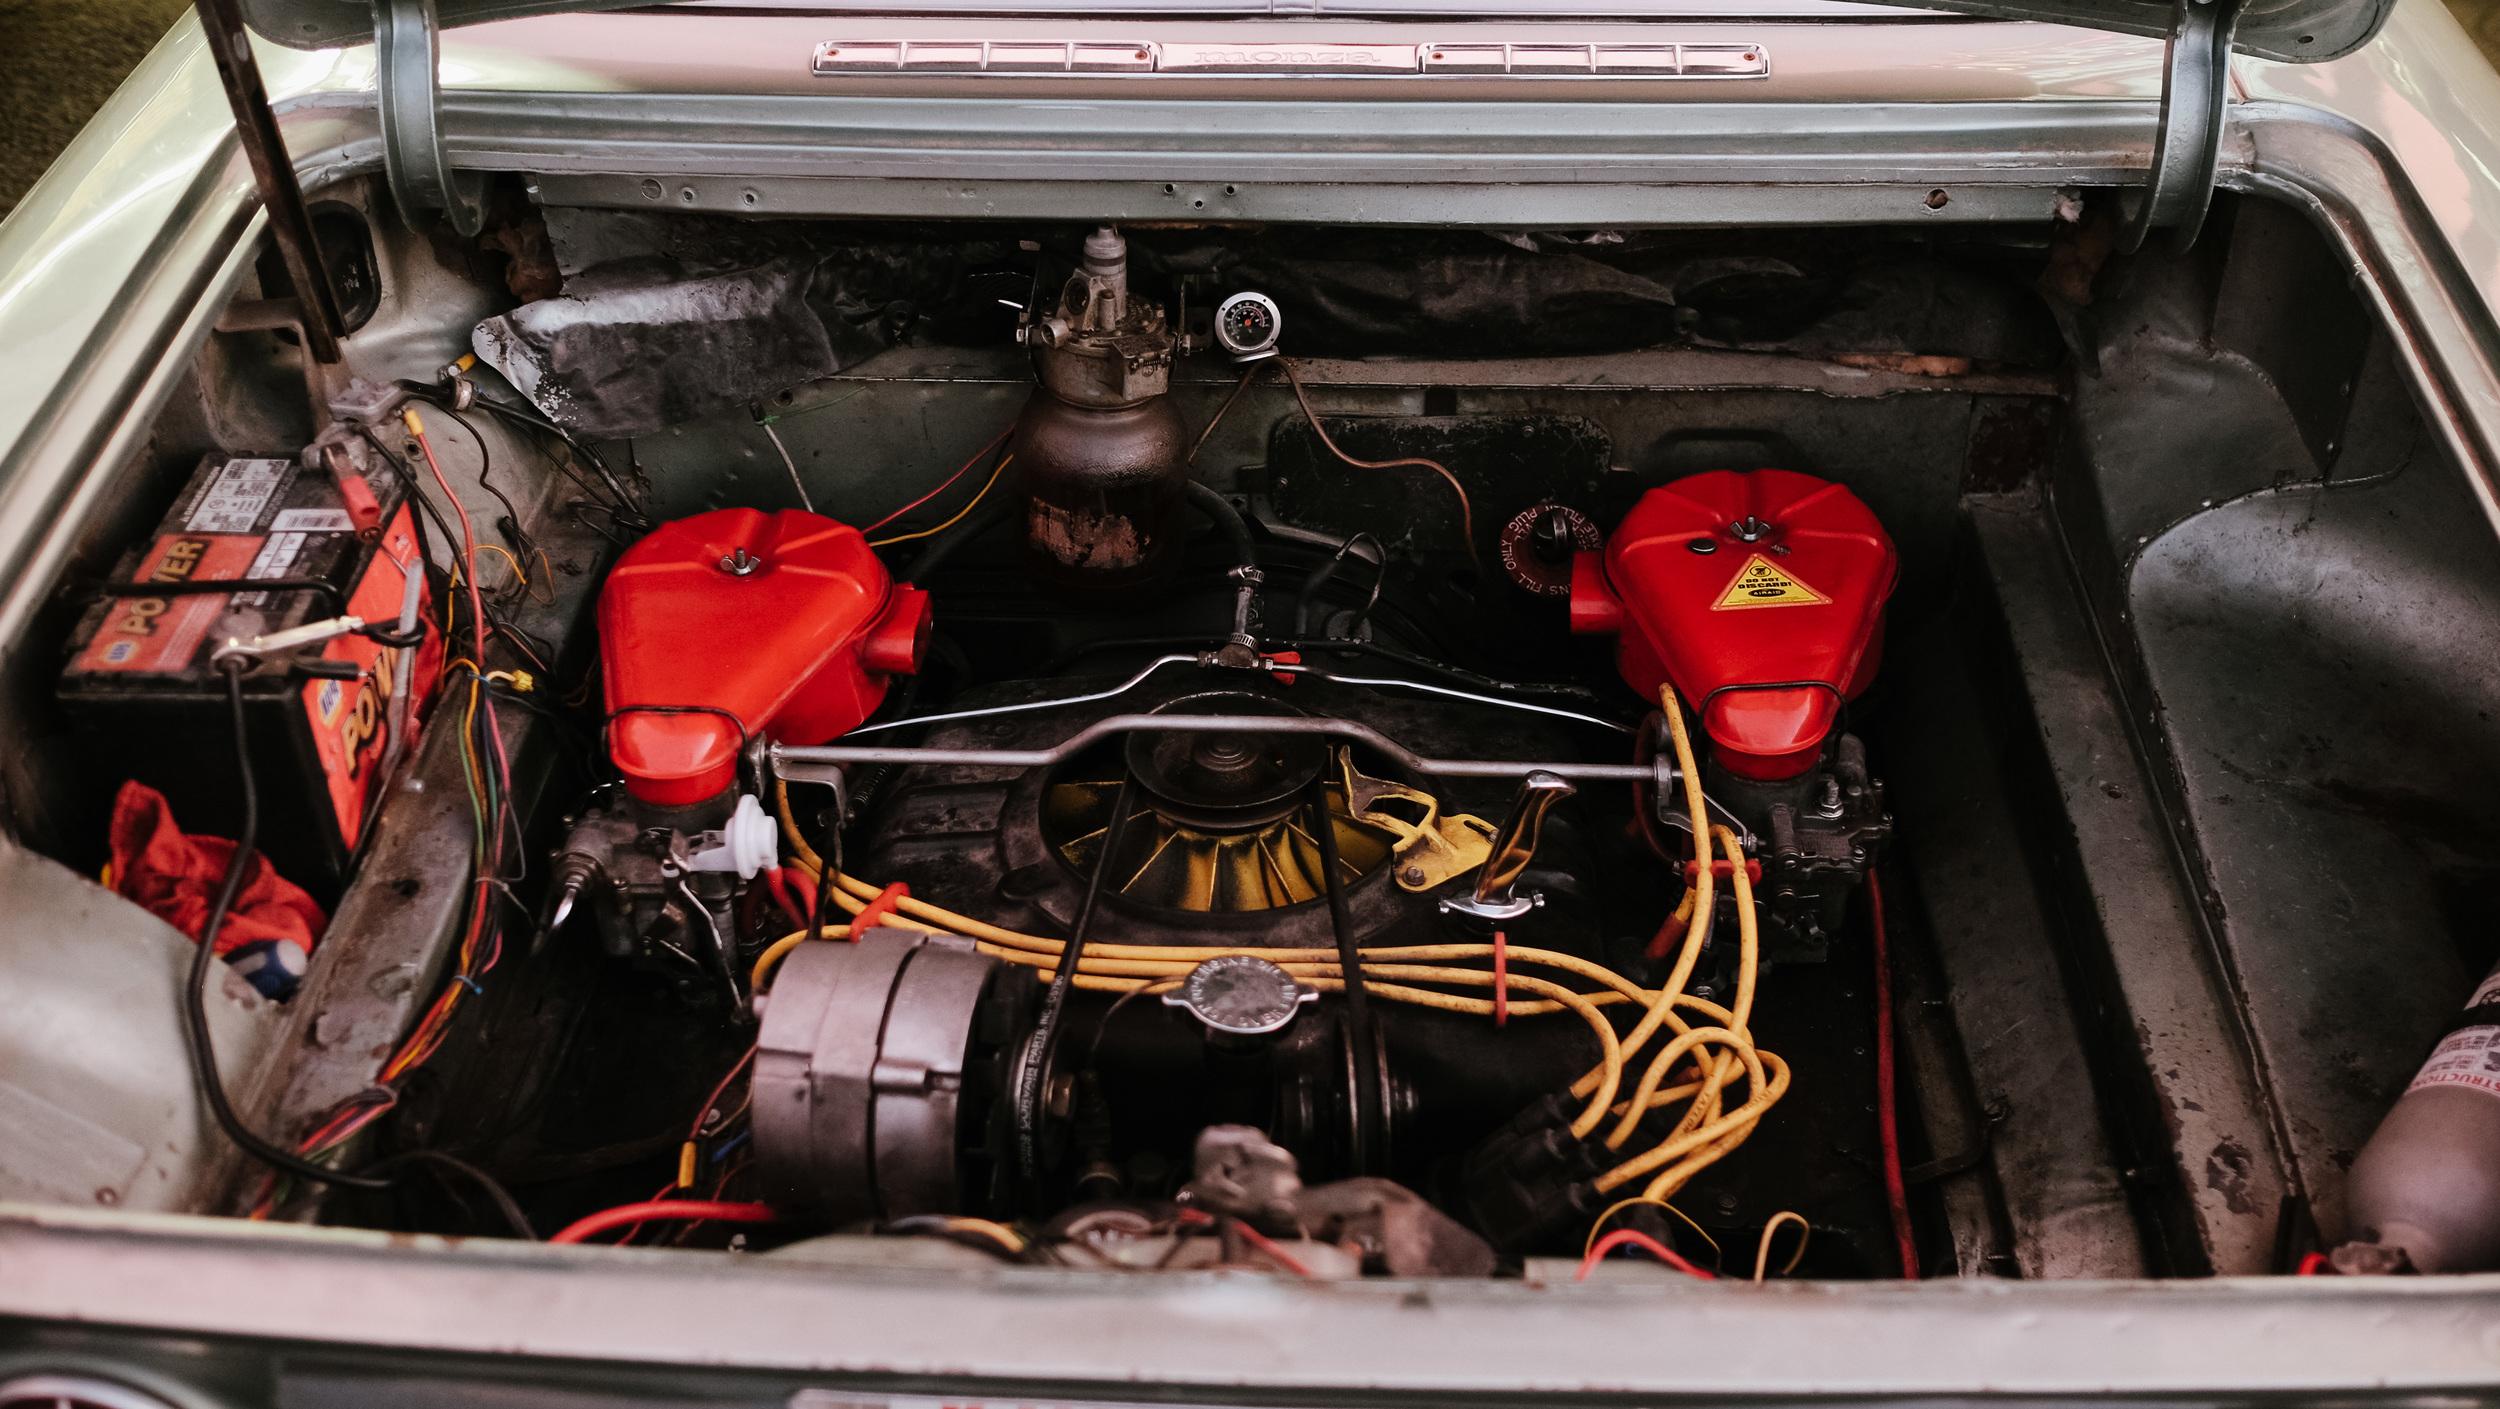 Top-Notch-Car-Show-09052015-2604.jpg